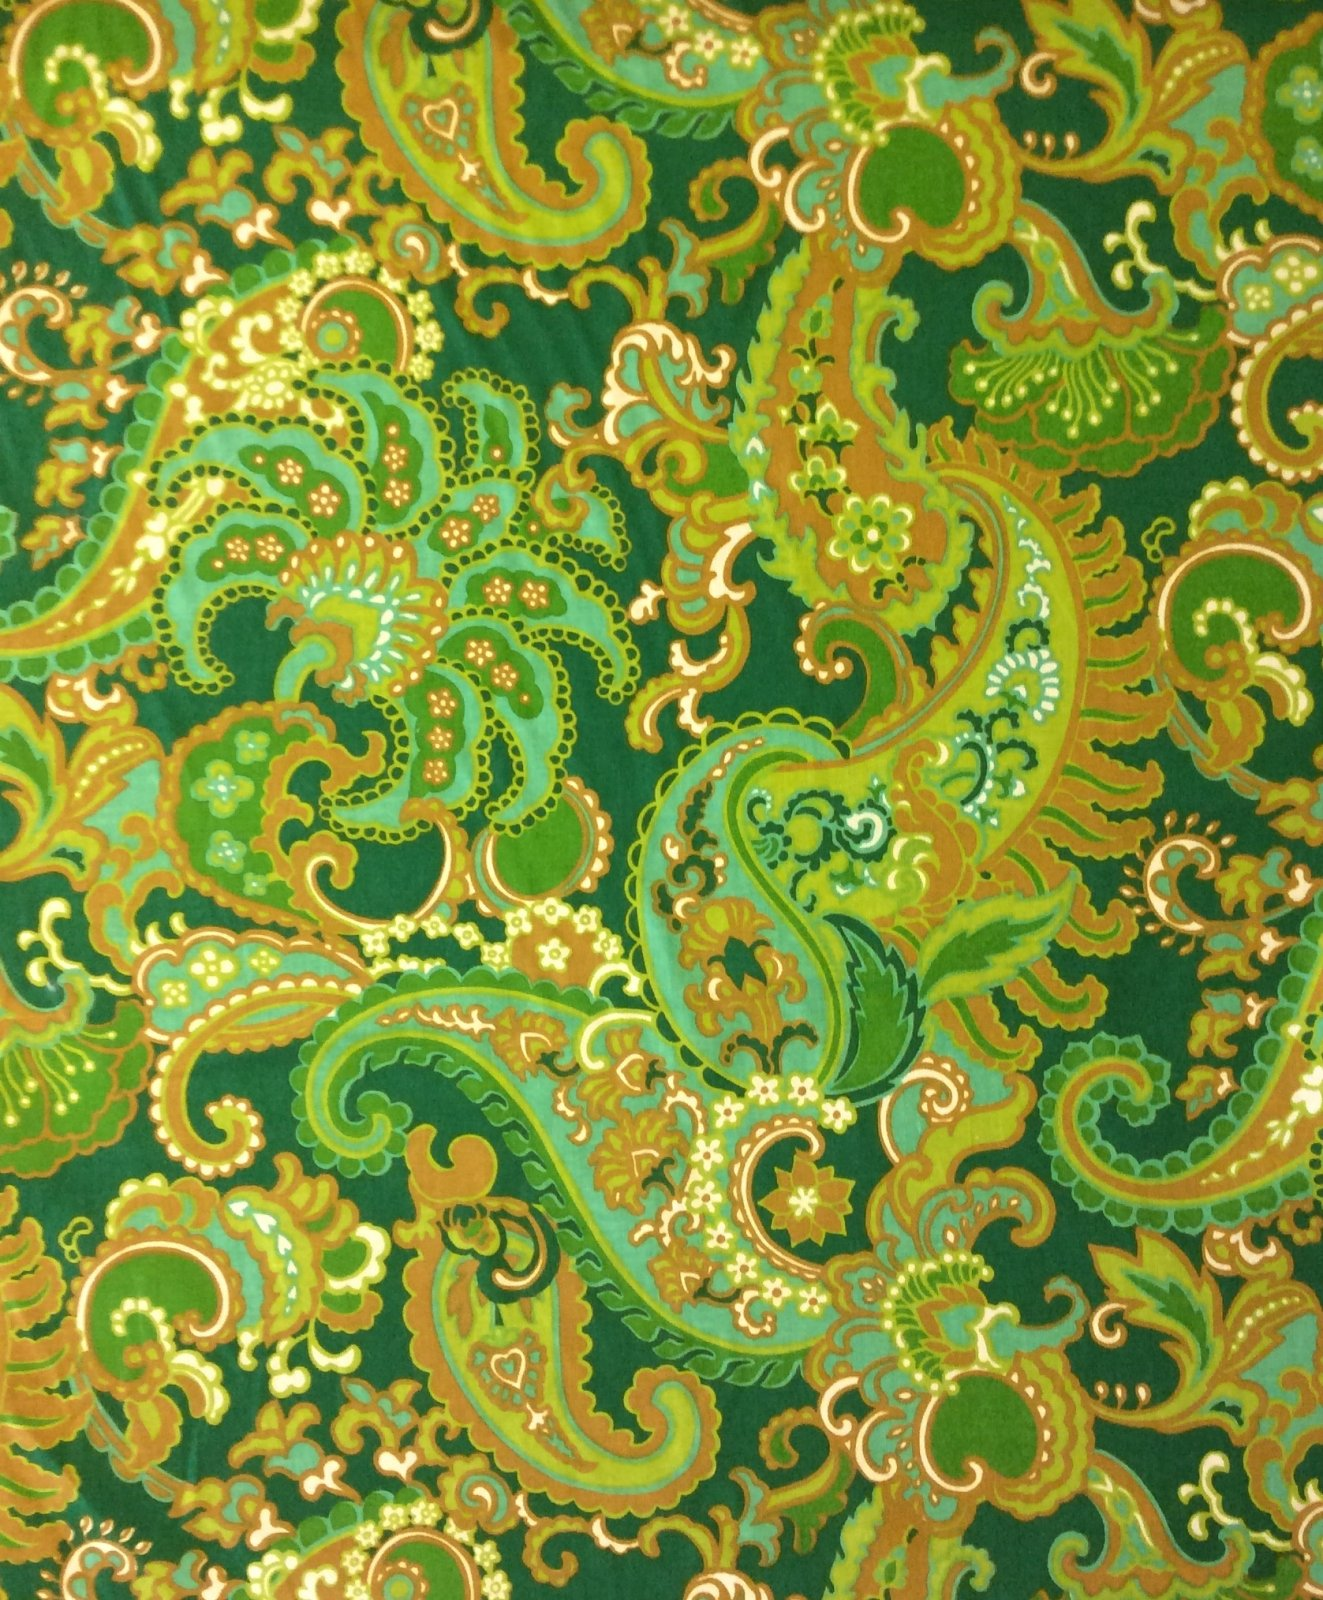 RARE! True Vintage Graphic Retro Paisley Green and Aqua Tone Abstract Kitschy Screen Printed Mid Century Home Decor Fabric TRV009